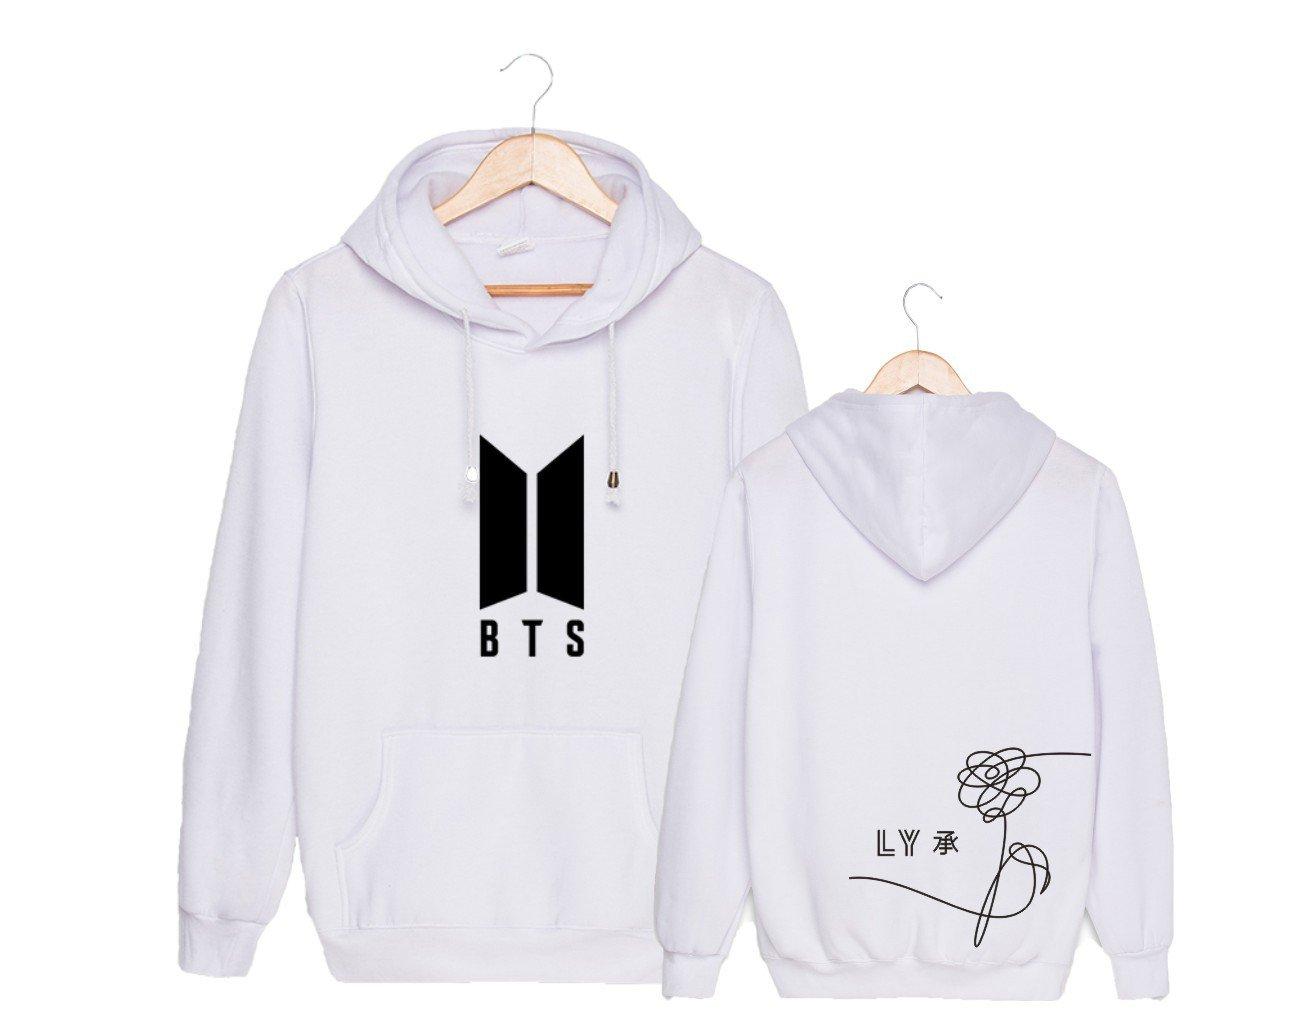 Lifestar Kpop BTS Love Yourself Hoodie JIMIN Rap Monster Sweatshirt Bangtan Boys Pullover (US L= Asia XXL, White)